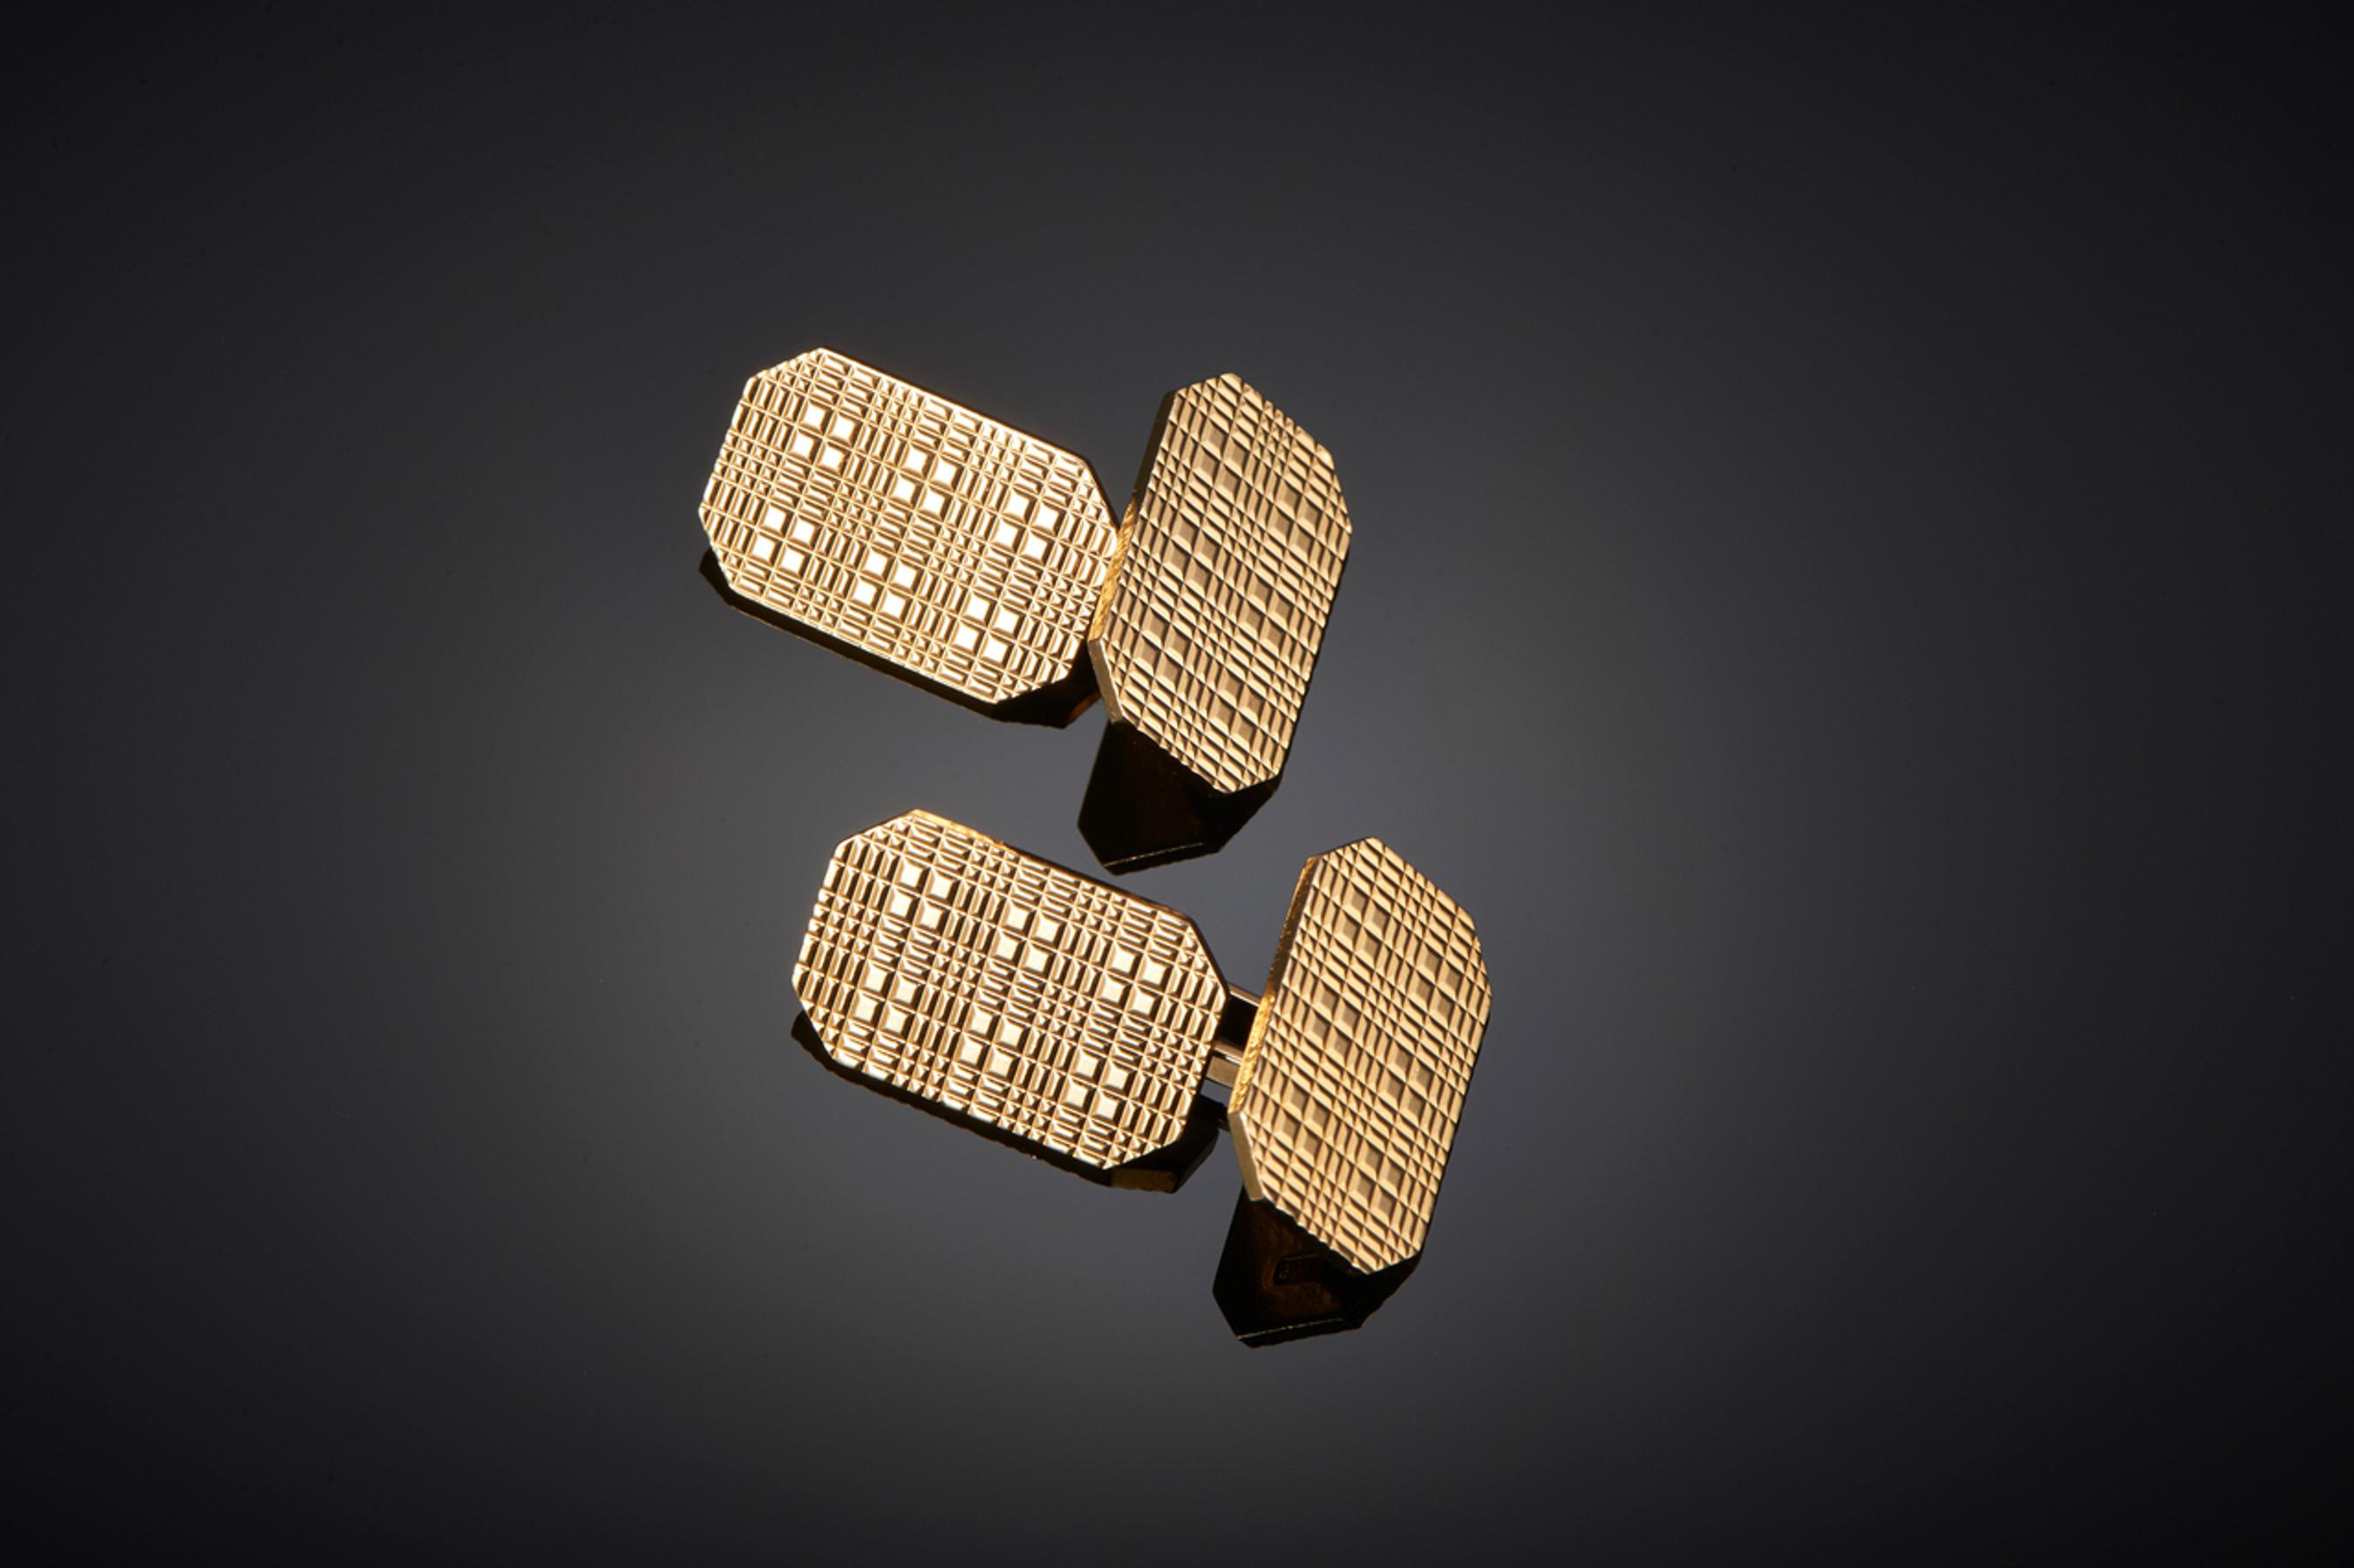 Elegant Pair of Octagonal Cufflinks by Kutchinsky. - Front Image